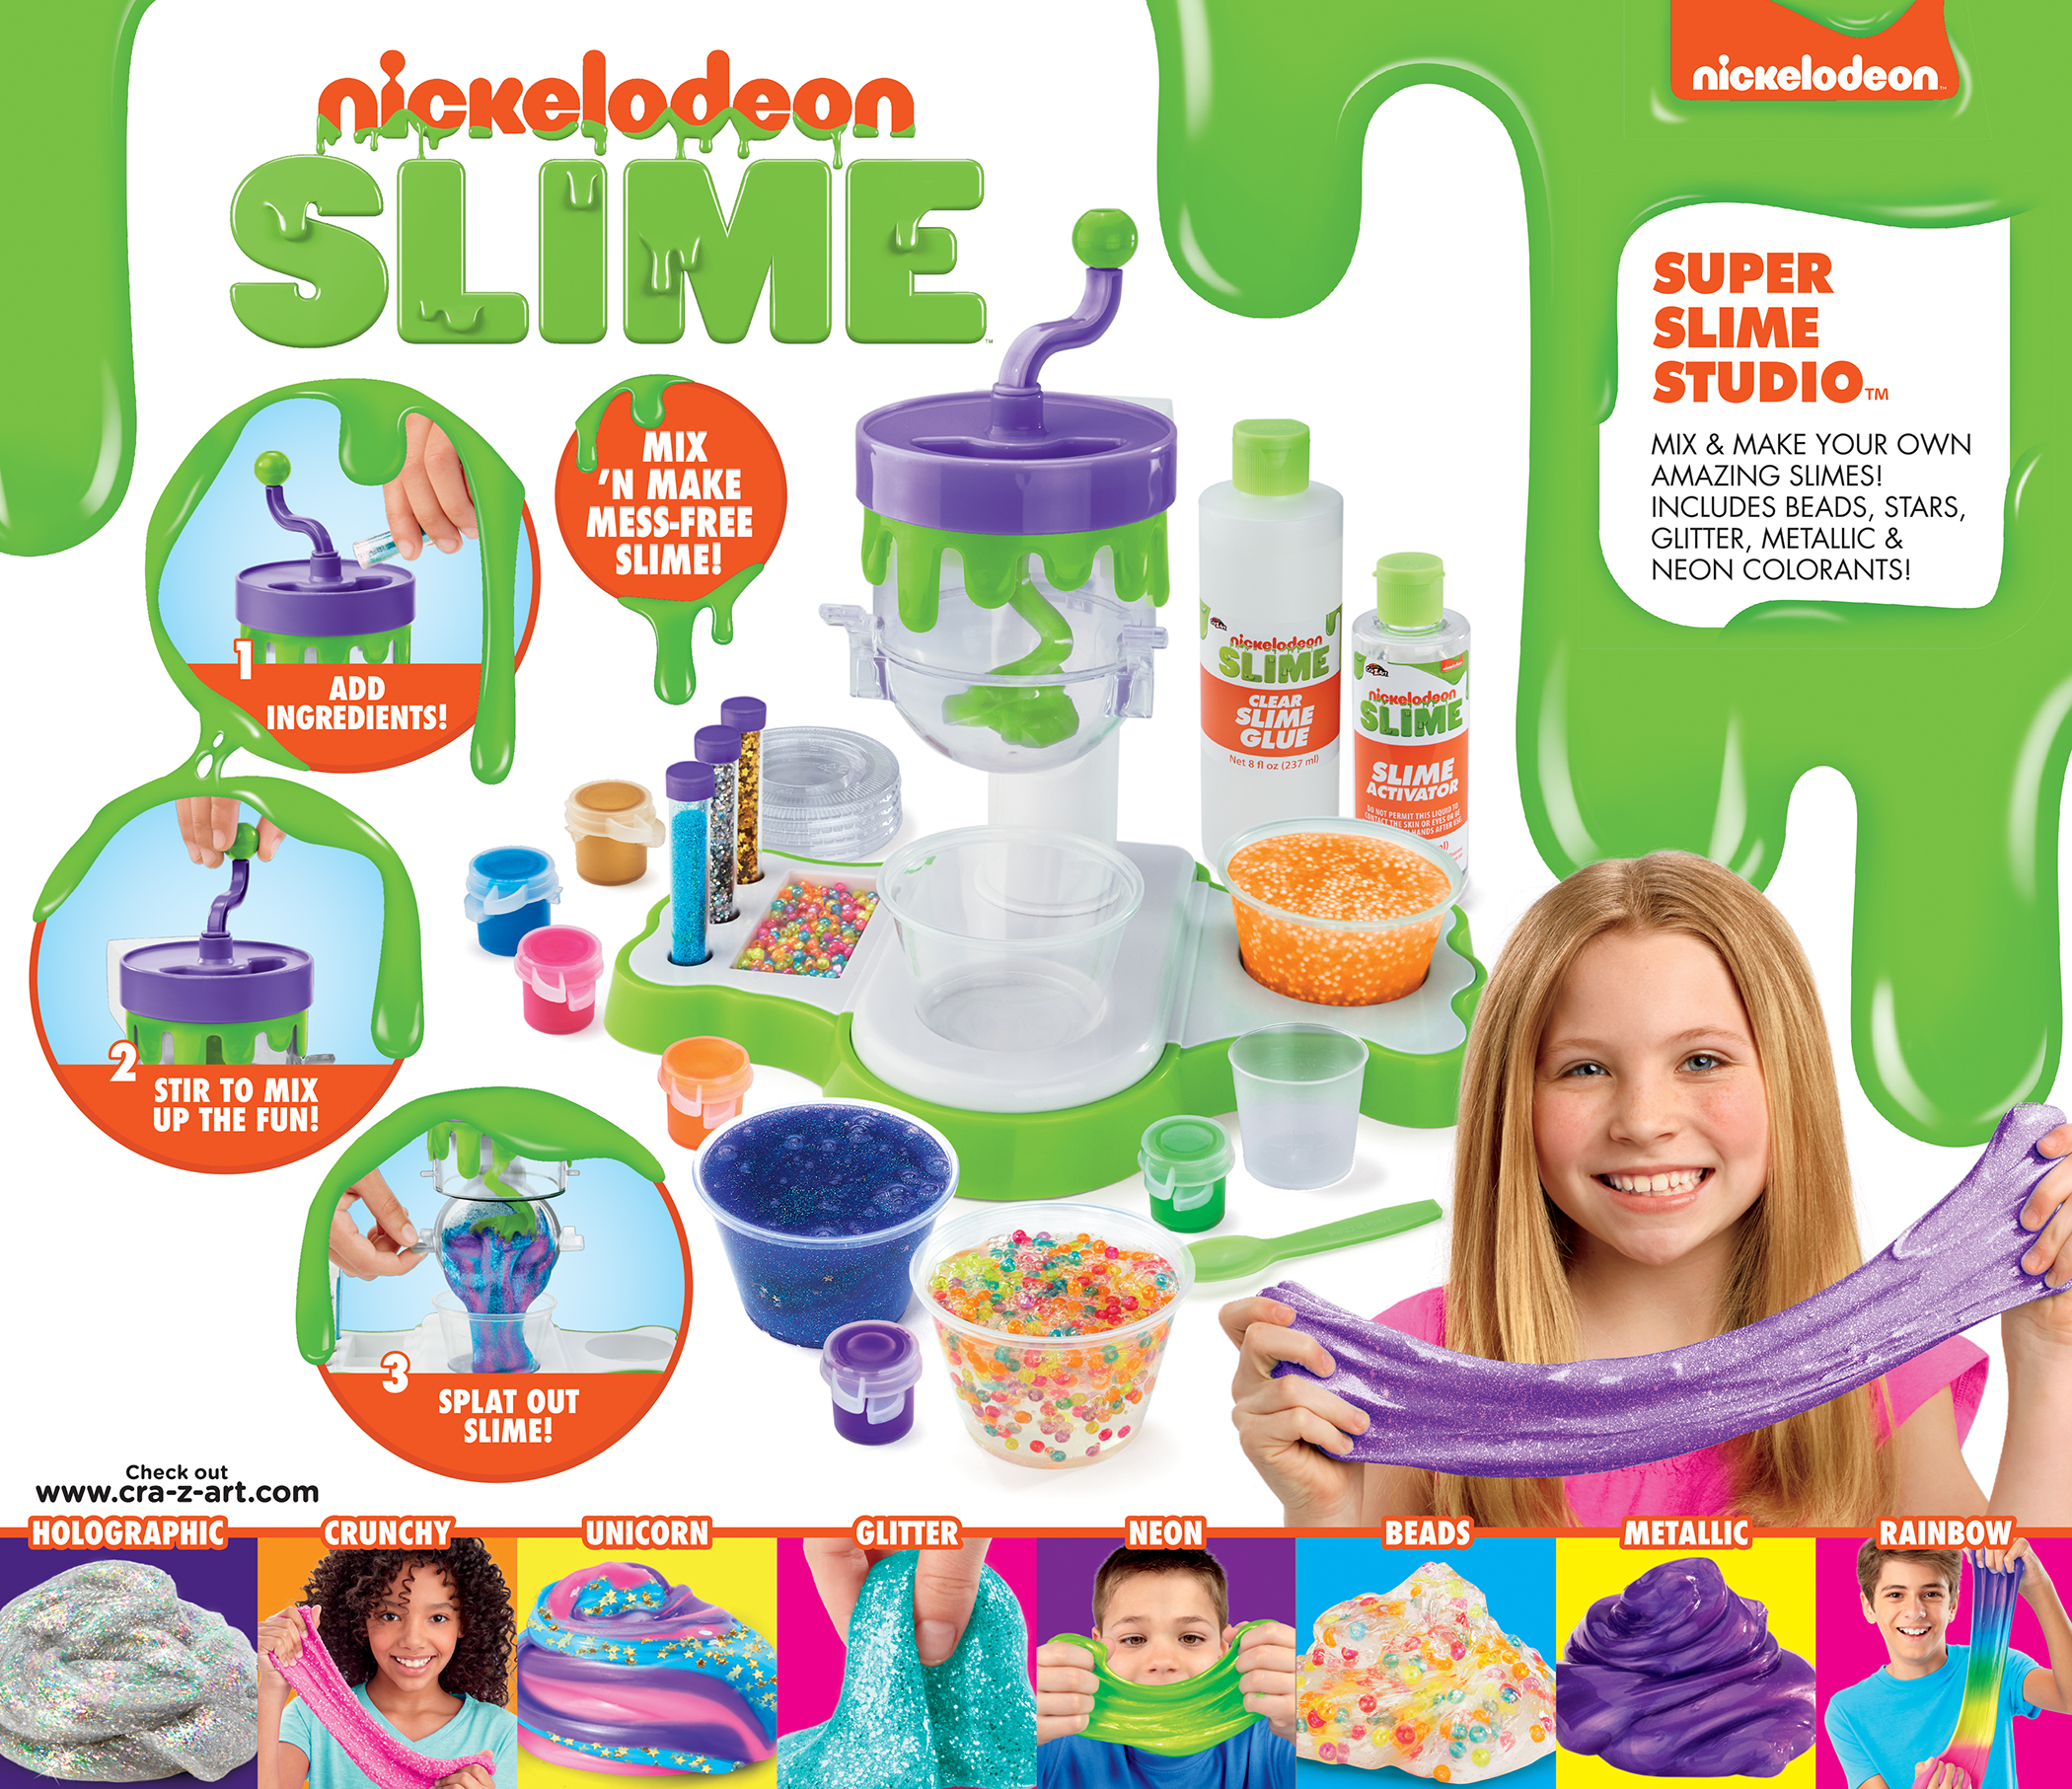 Ultimate Scented Glitter Slime Studio Fun Arts DIY Activities Ideal Kids Gift